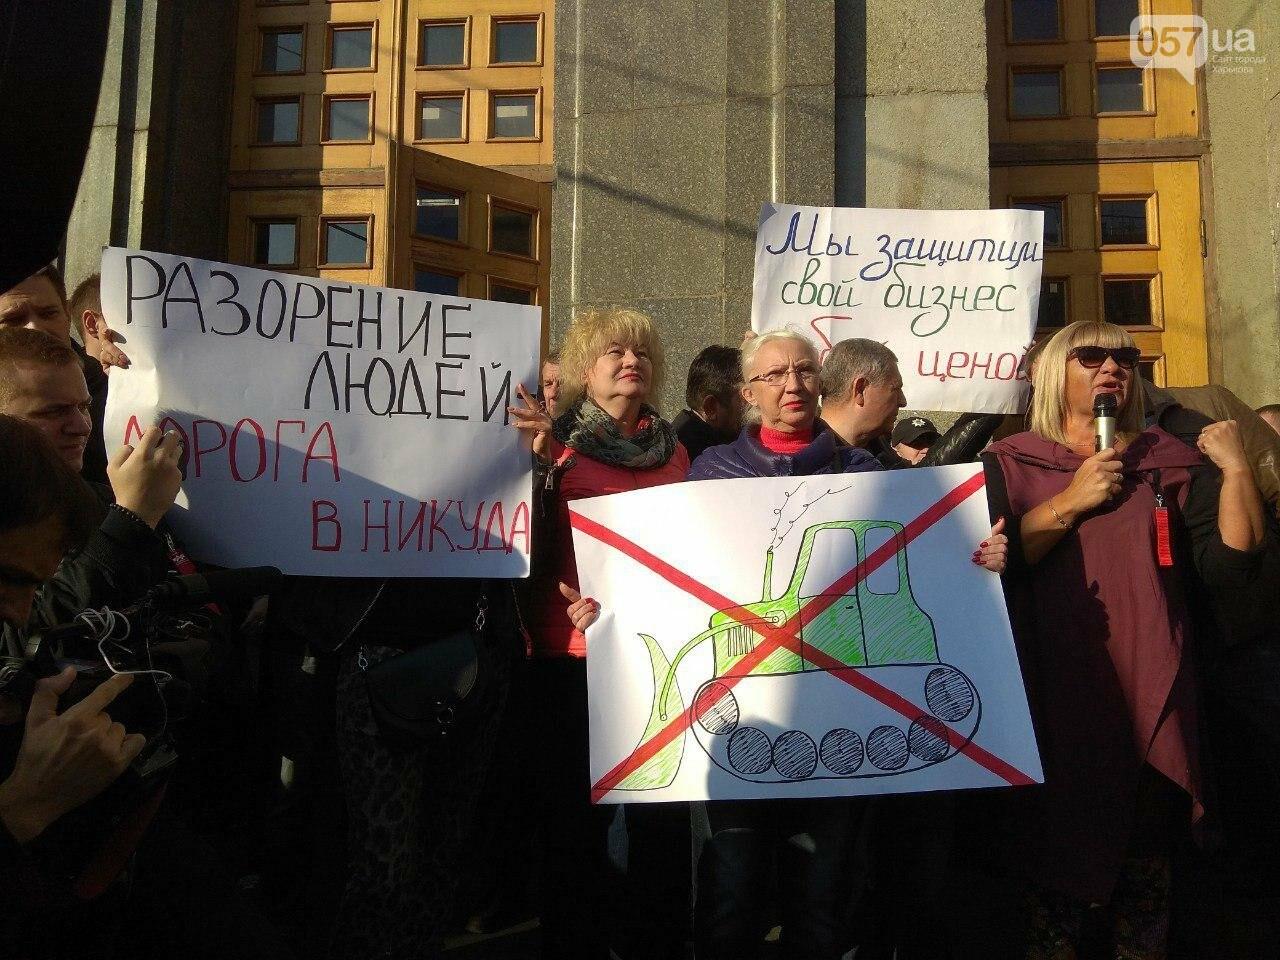 «Нам дорога не нужна»: предприниматели «Барабашово» пикетируют горсовет, - ФОТО, фото-6